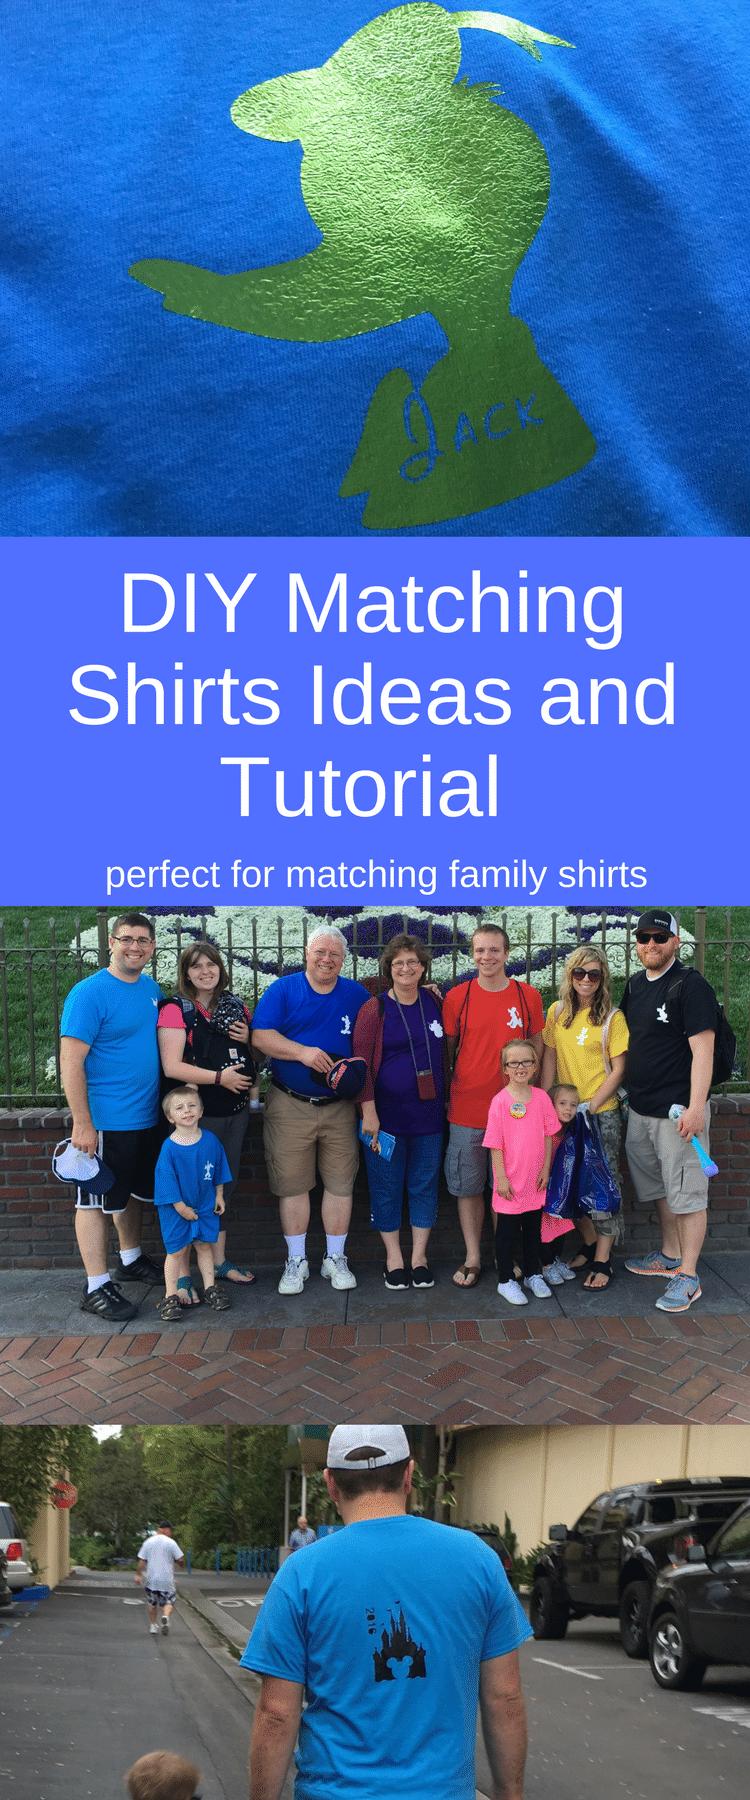 DIY Disneyland Shirt / Matching Disneyland Shirts / Family Disneyland Shirts / Disneyland T-Shirts / Disneyland Shirt